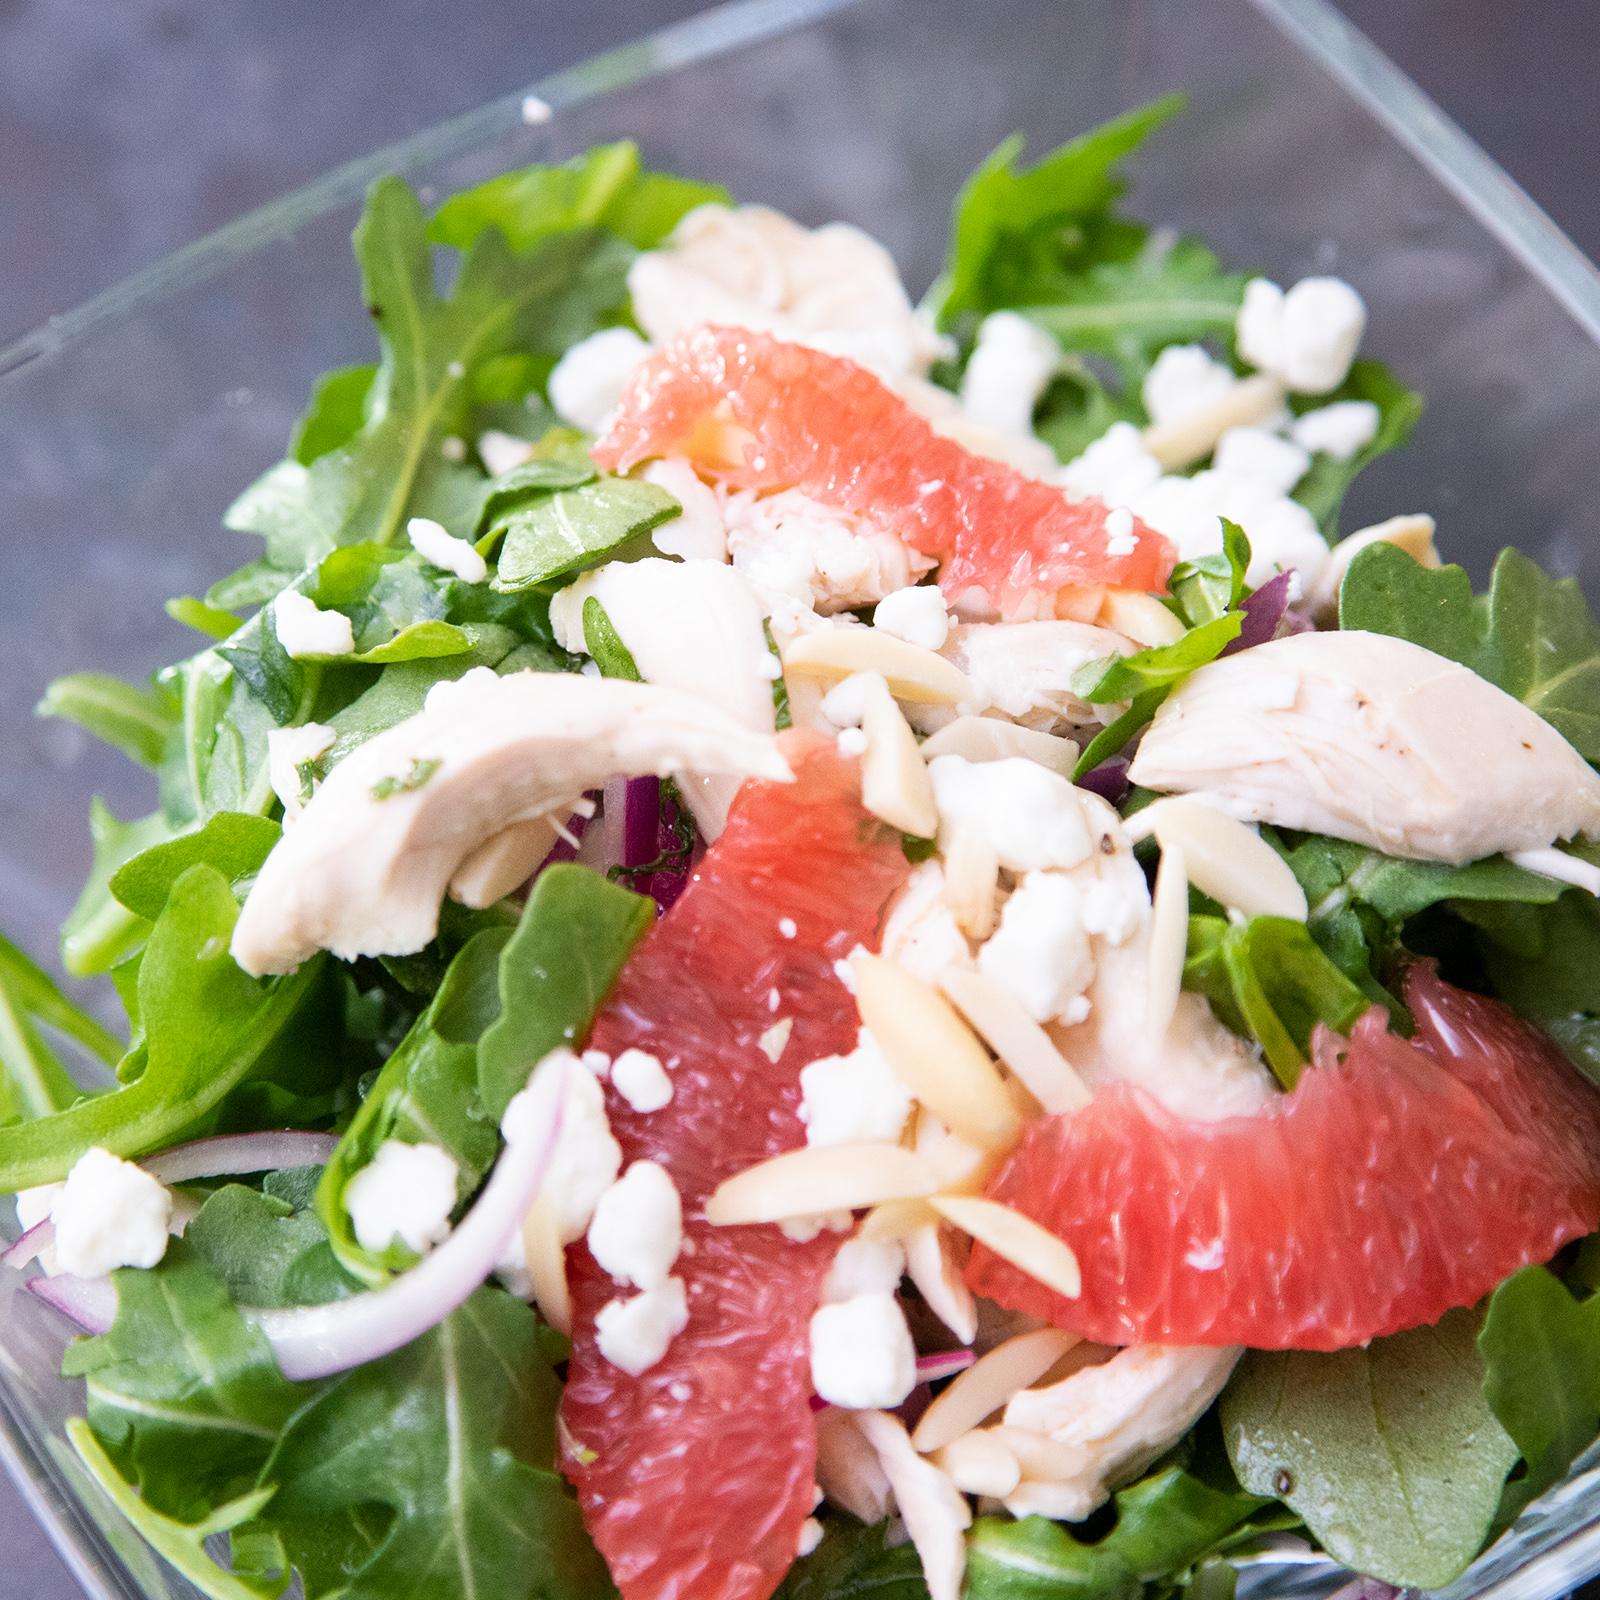 Chicken and Arugula Salad With Grapefruit